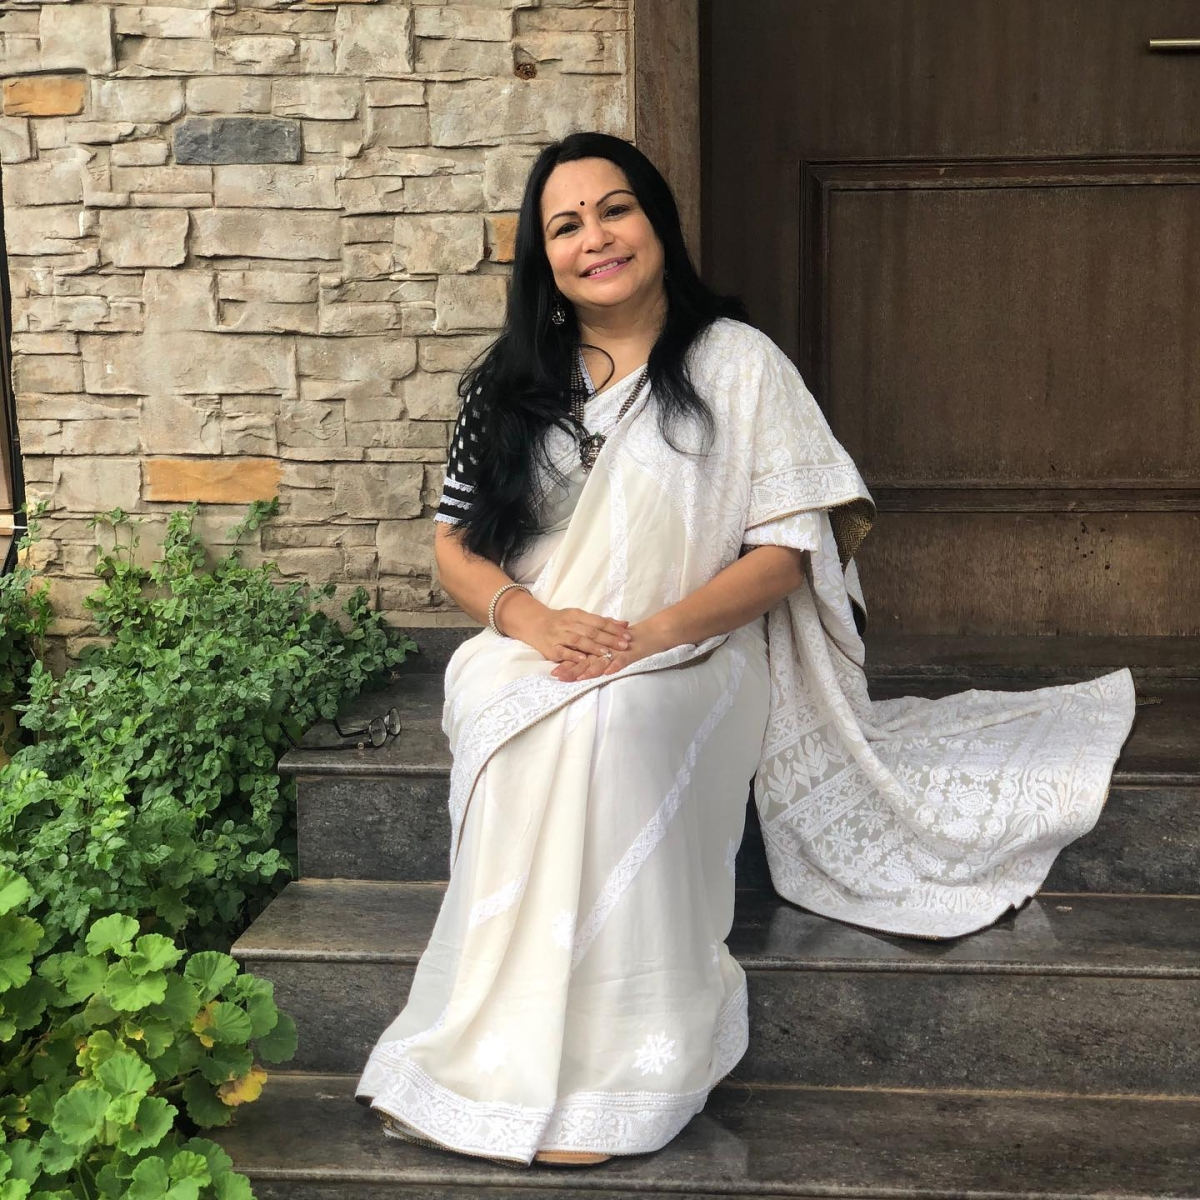 'I make a public commitment that I will be a vegetarian if...': Shefali Vaidya challenges PETA India